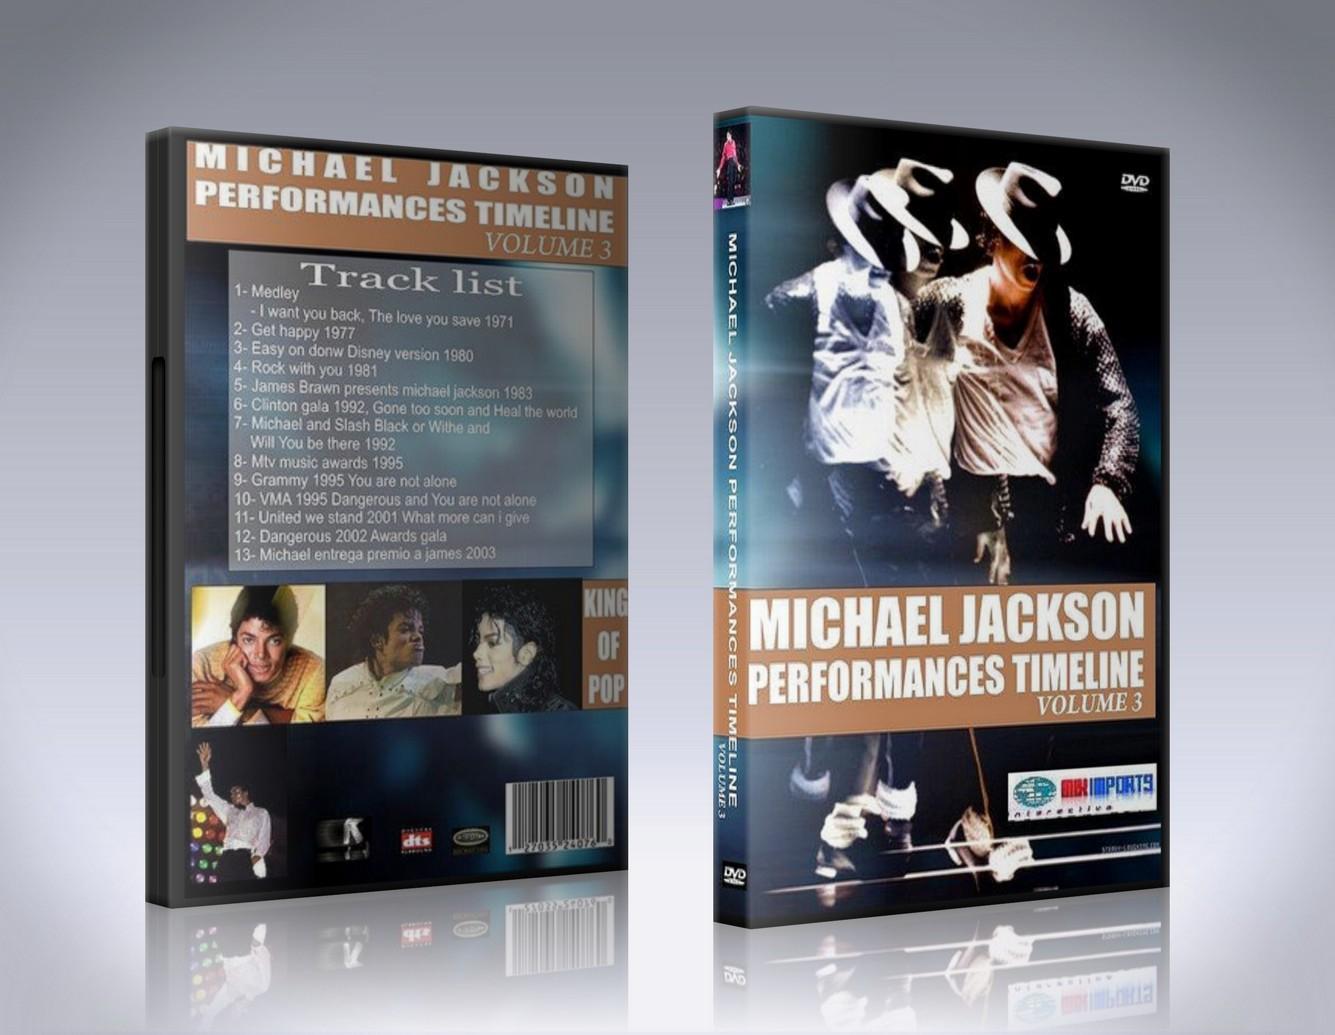 http://4.bp.blogspot.com/-bbgV_-3K1HY/UJP-3tUuraI/AAAAAAAAHqs/OXU0epCrcoc/s1600/DVD+Show+Michael+Jackson+-+Performances+Timeline+Vol.3.jpg